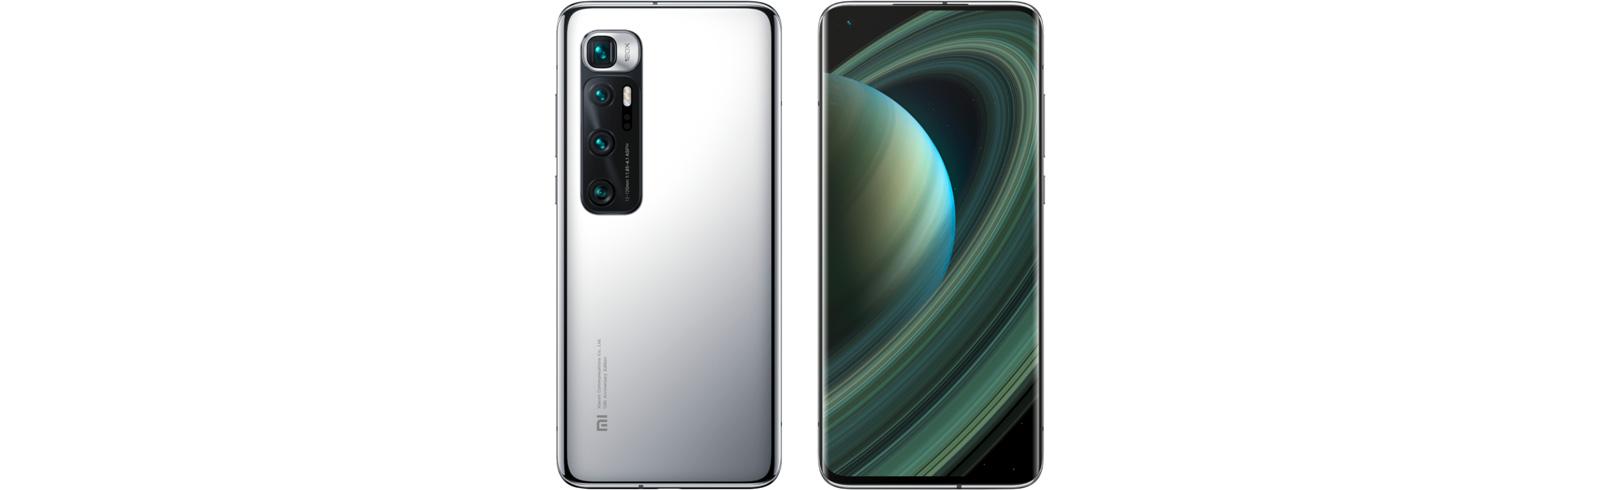 Xiaomi Mi 10 Ultra is finally announced